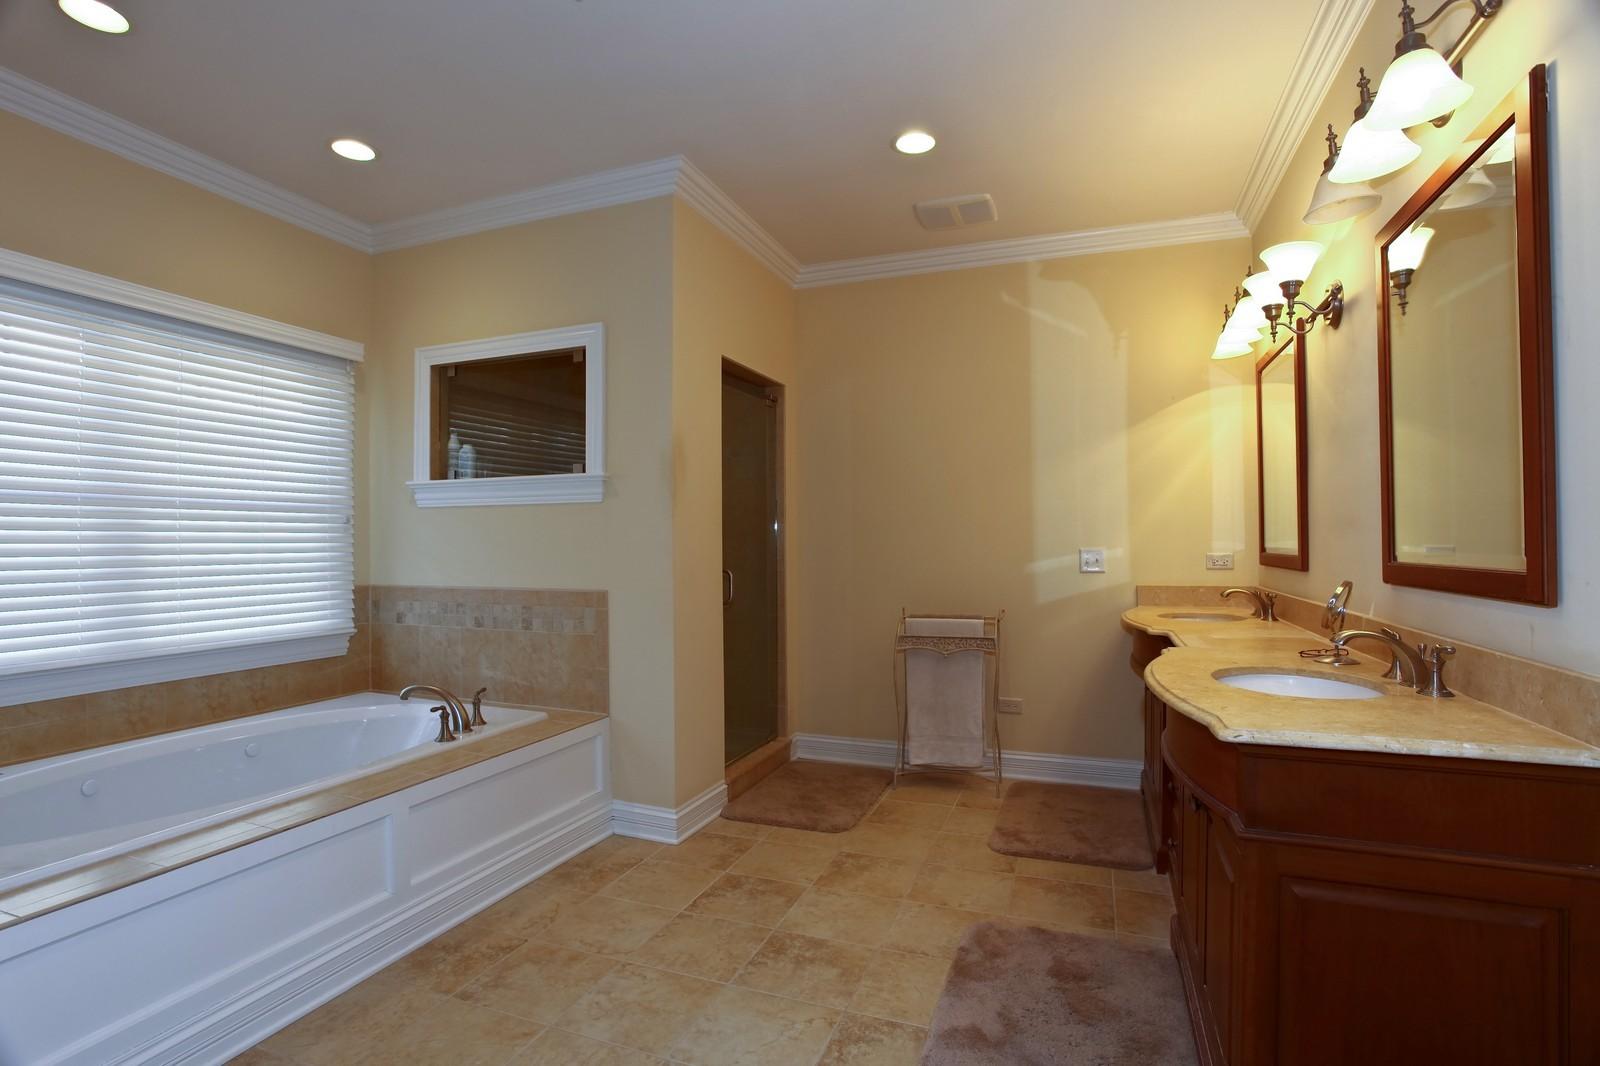 Real Estate Photography - 663 N Webster Street, Naperville, IL, 60563 - Master Bathroom